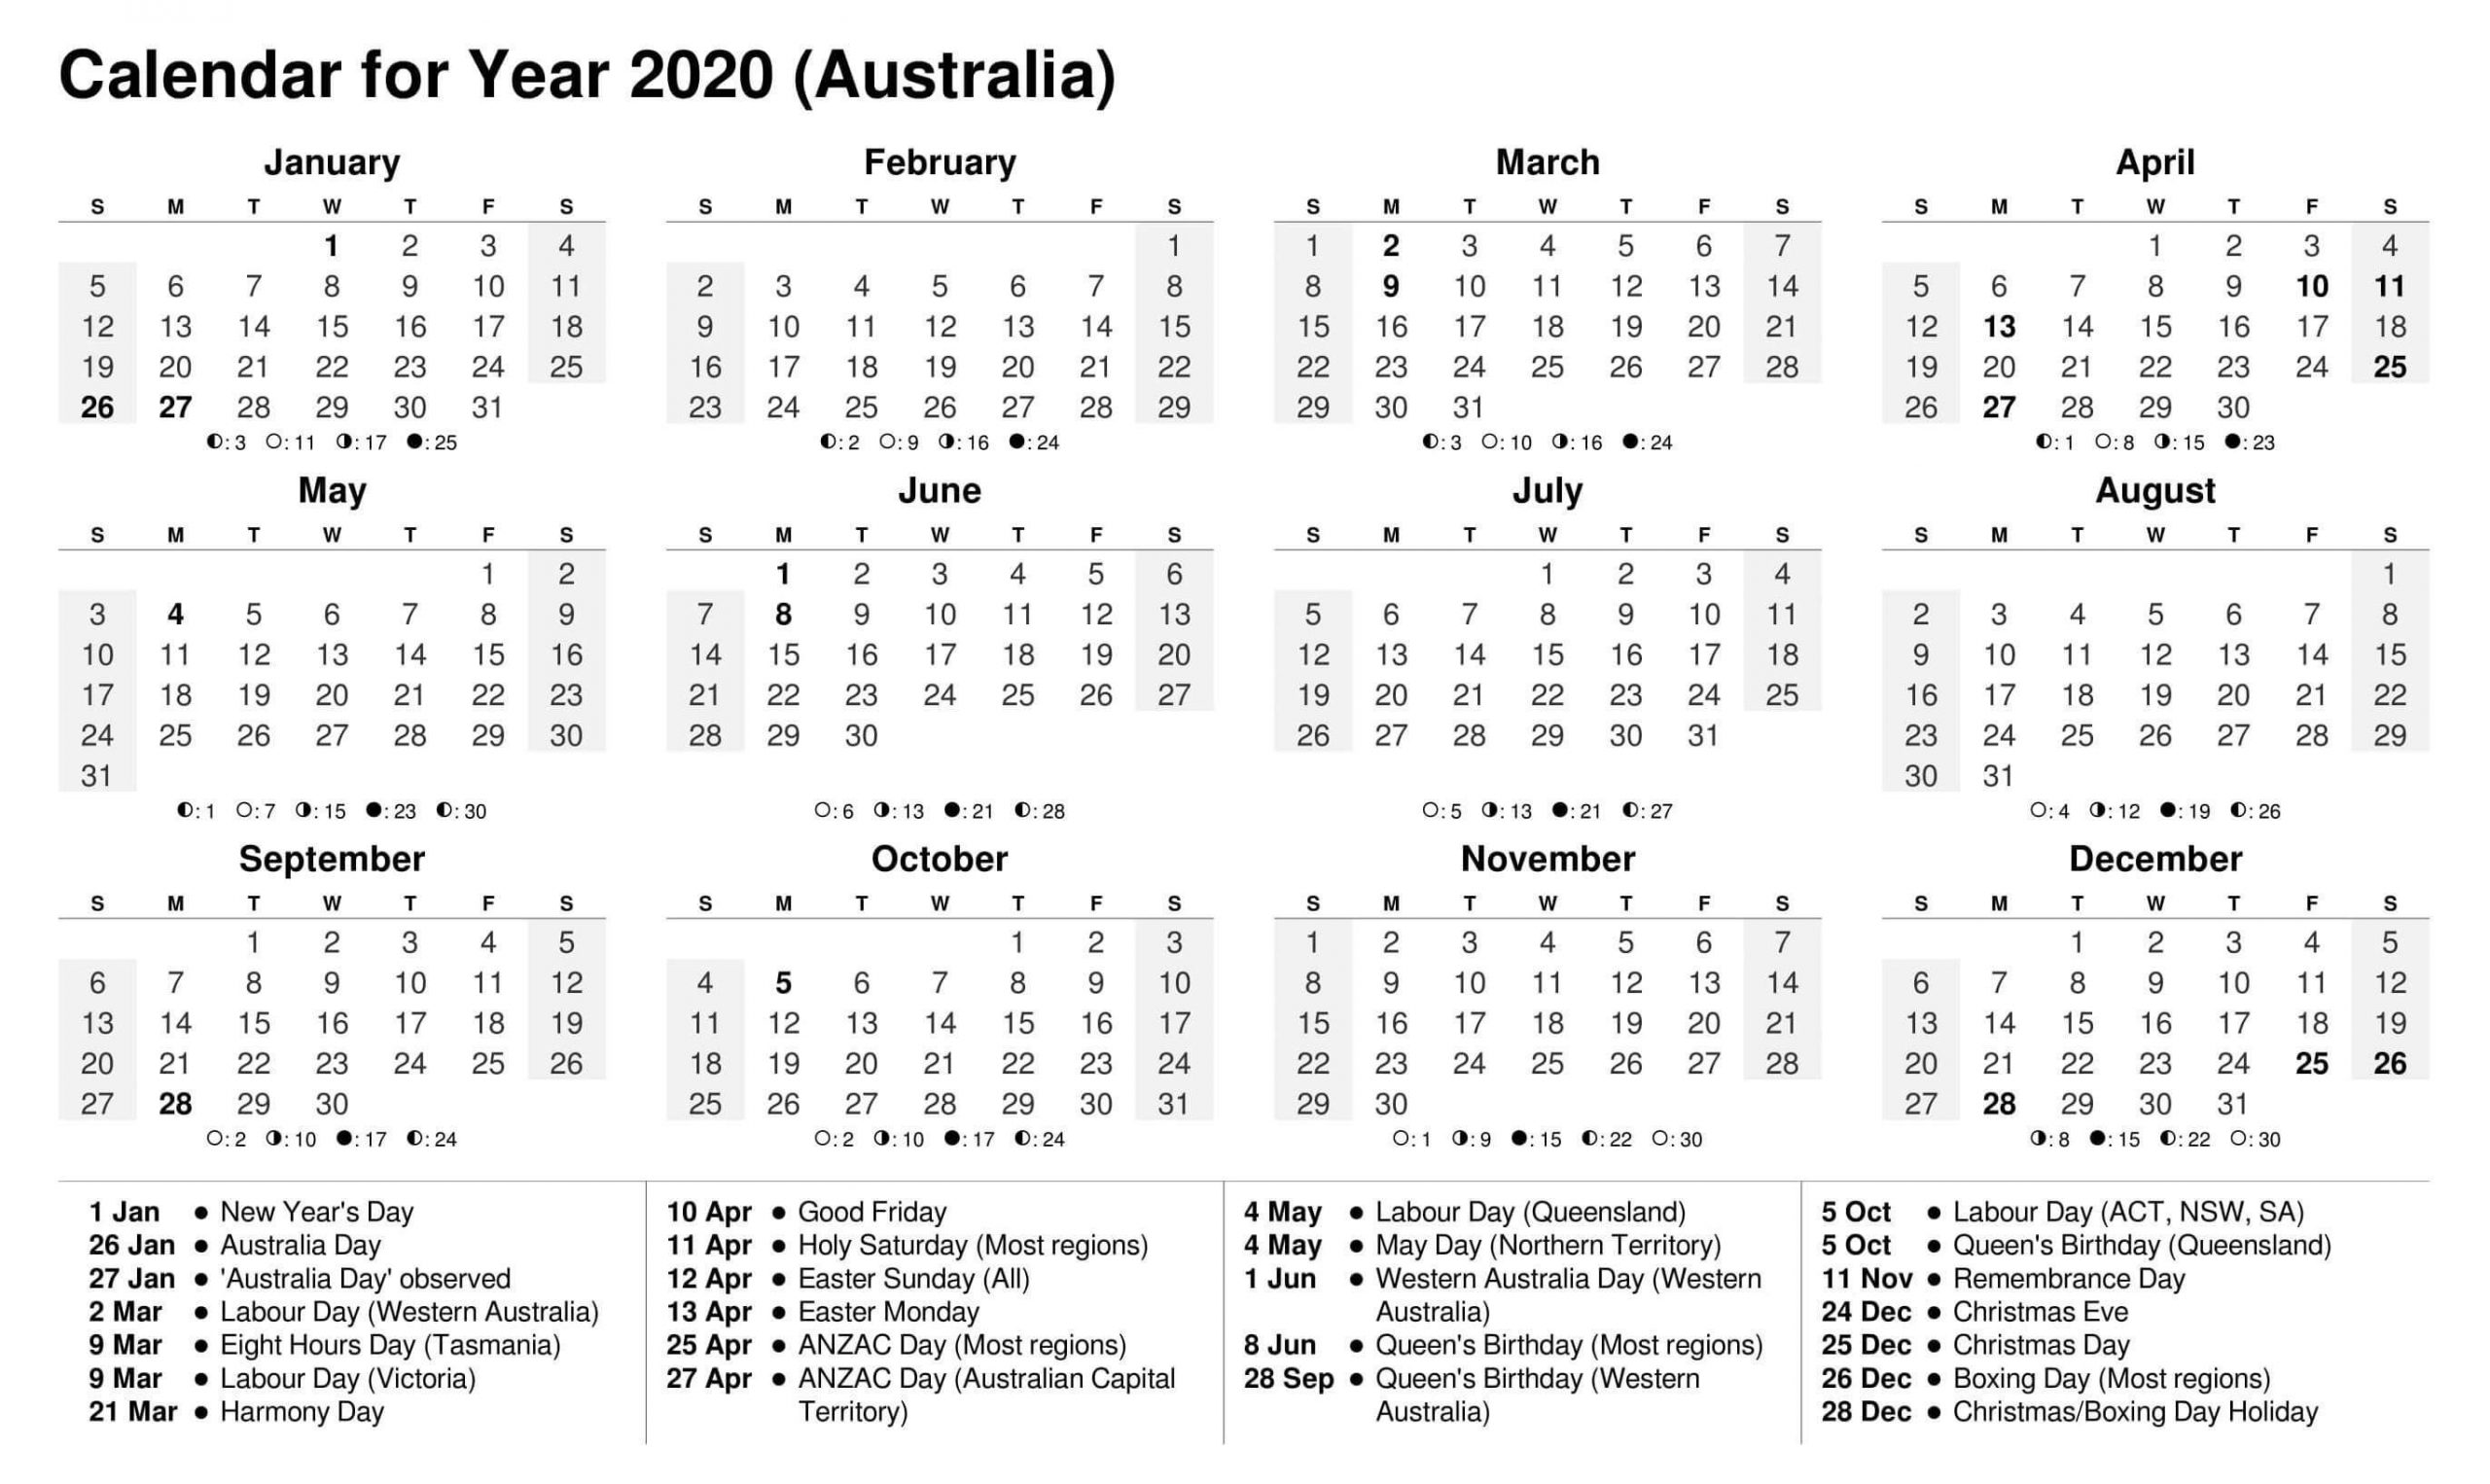 Calendar Year 2020 Holidays Template - 2019 Calendars For Holiday Time Off Calendar Excel